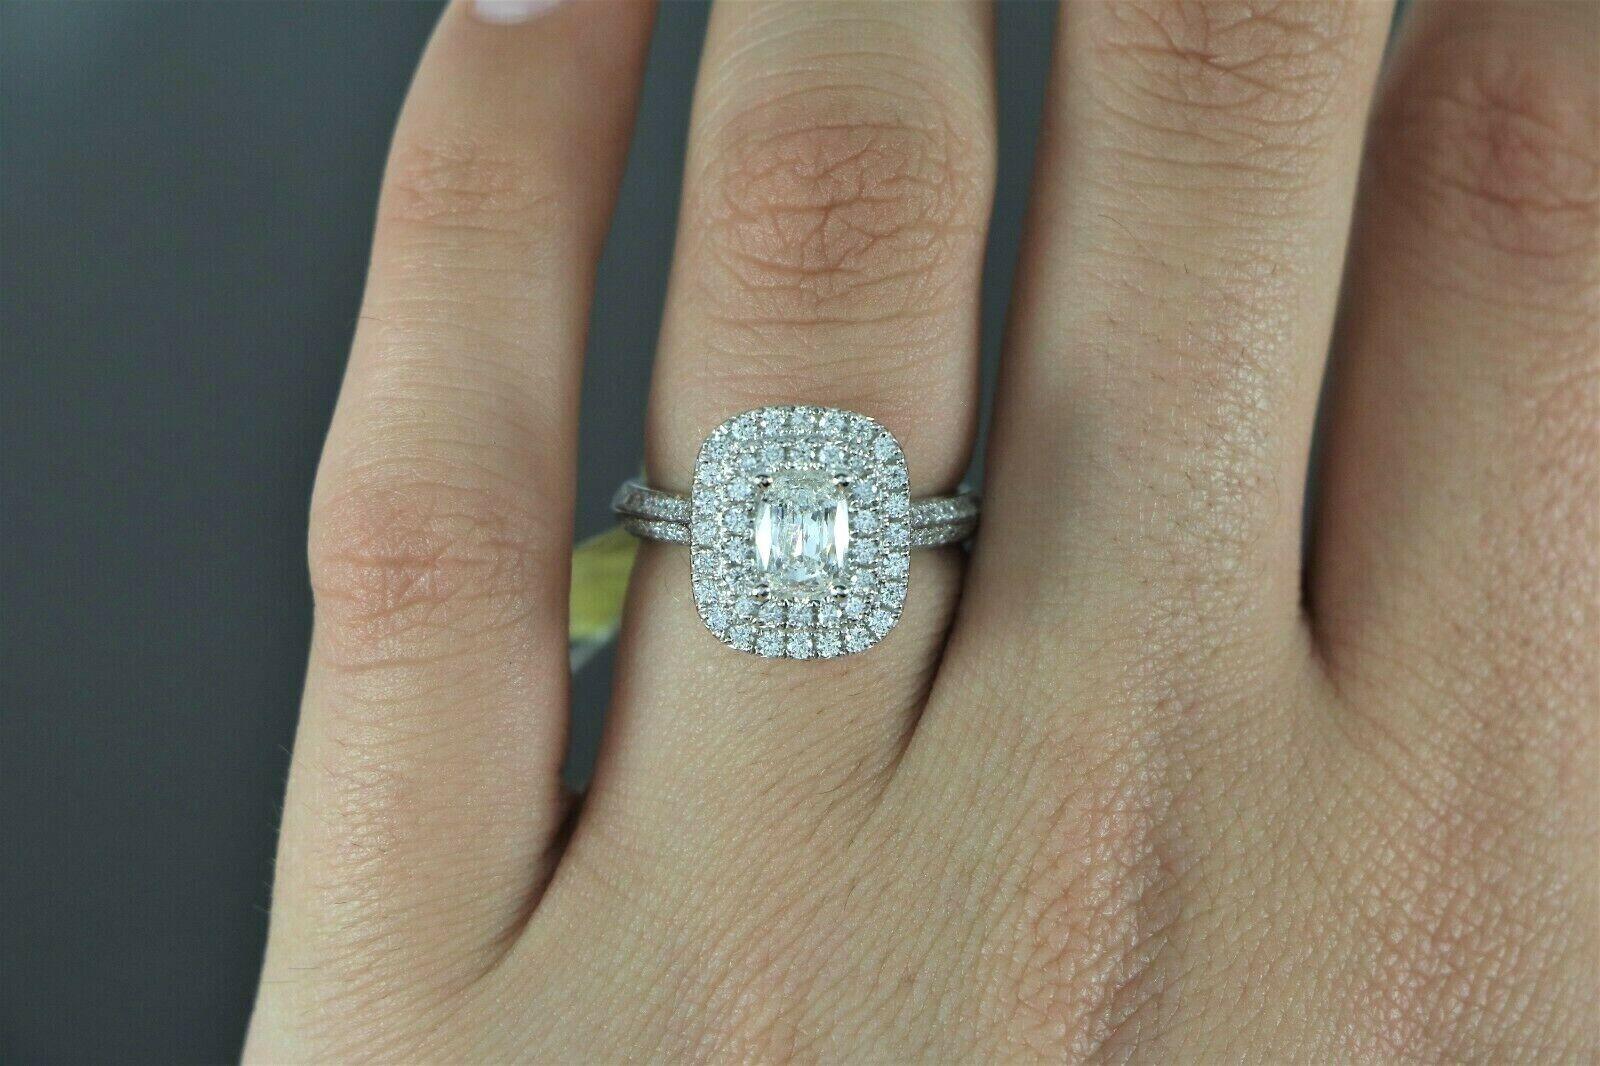 $5,150 S&S 14K White Gold 1.14ct GIA SI2 Cushion Diamond Halo Engagement Ring 6 2